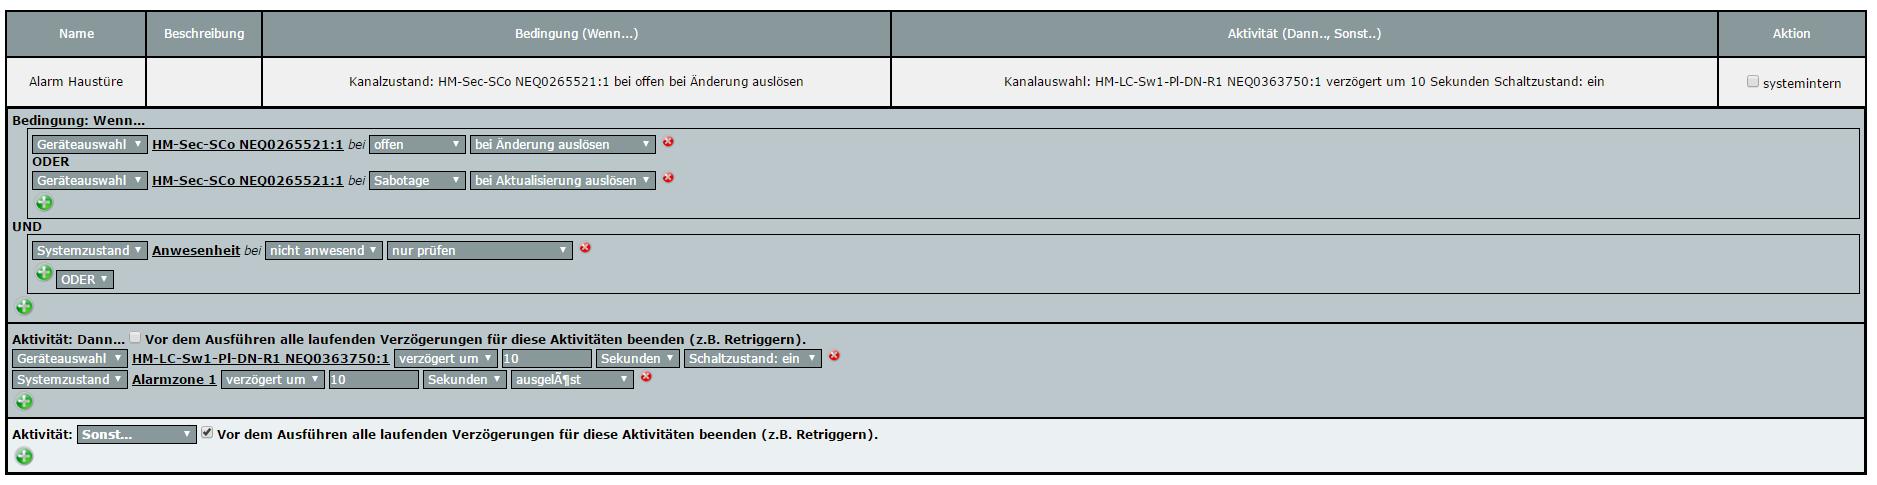 steuerung alarmanlage per wandtaster - homematic-forum / fhz-forum